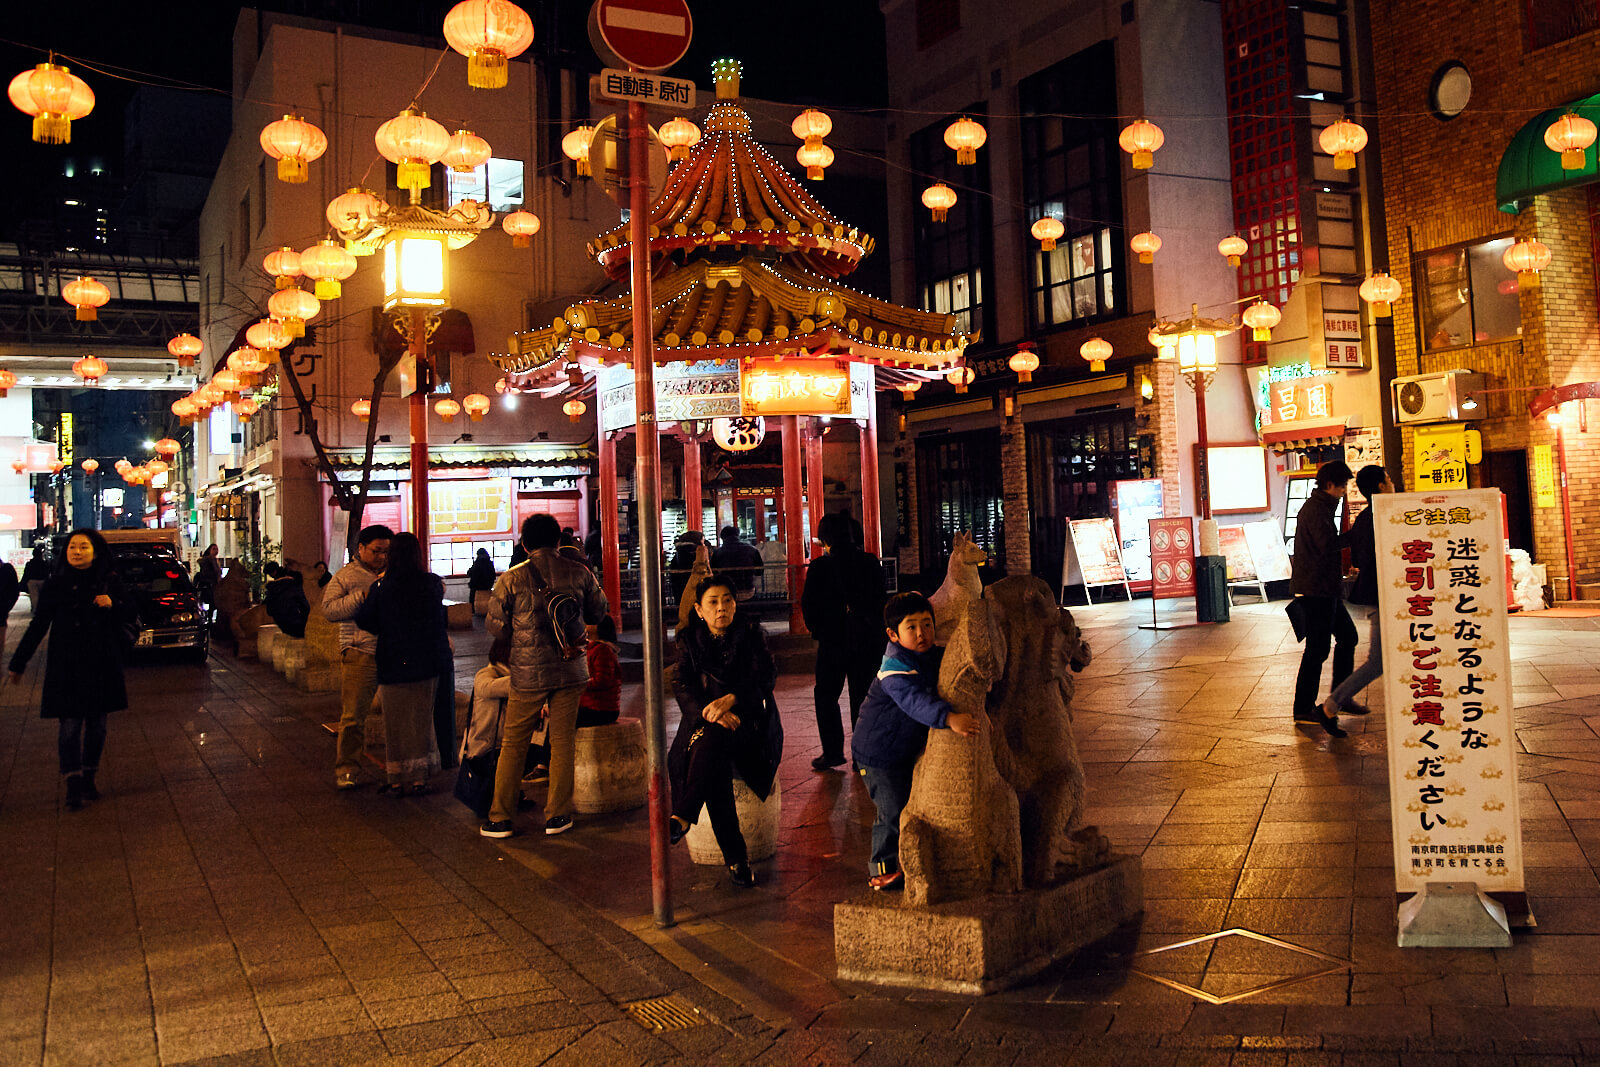 japan-travel-yukylutz 311233